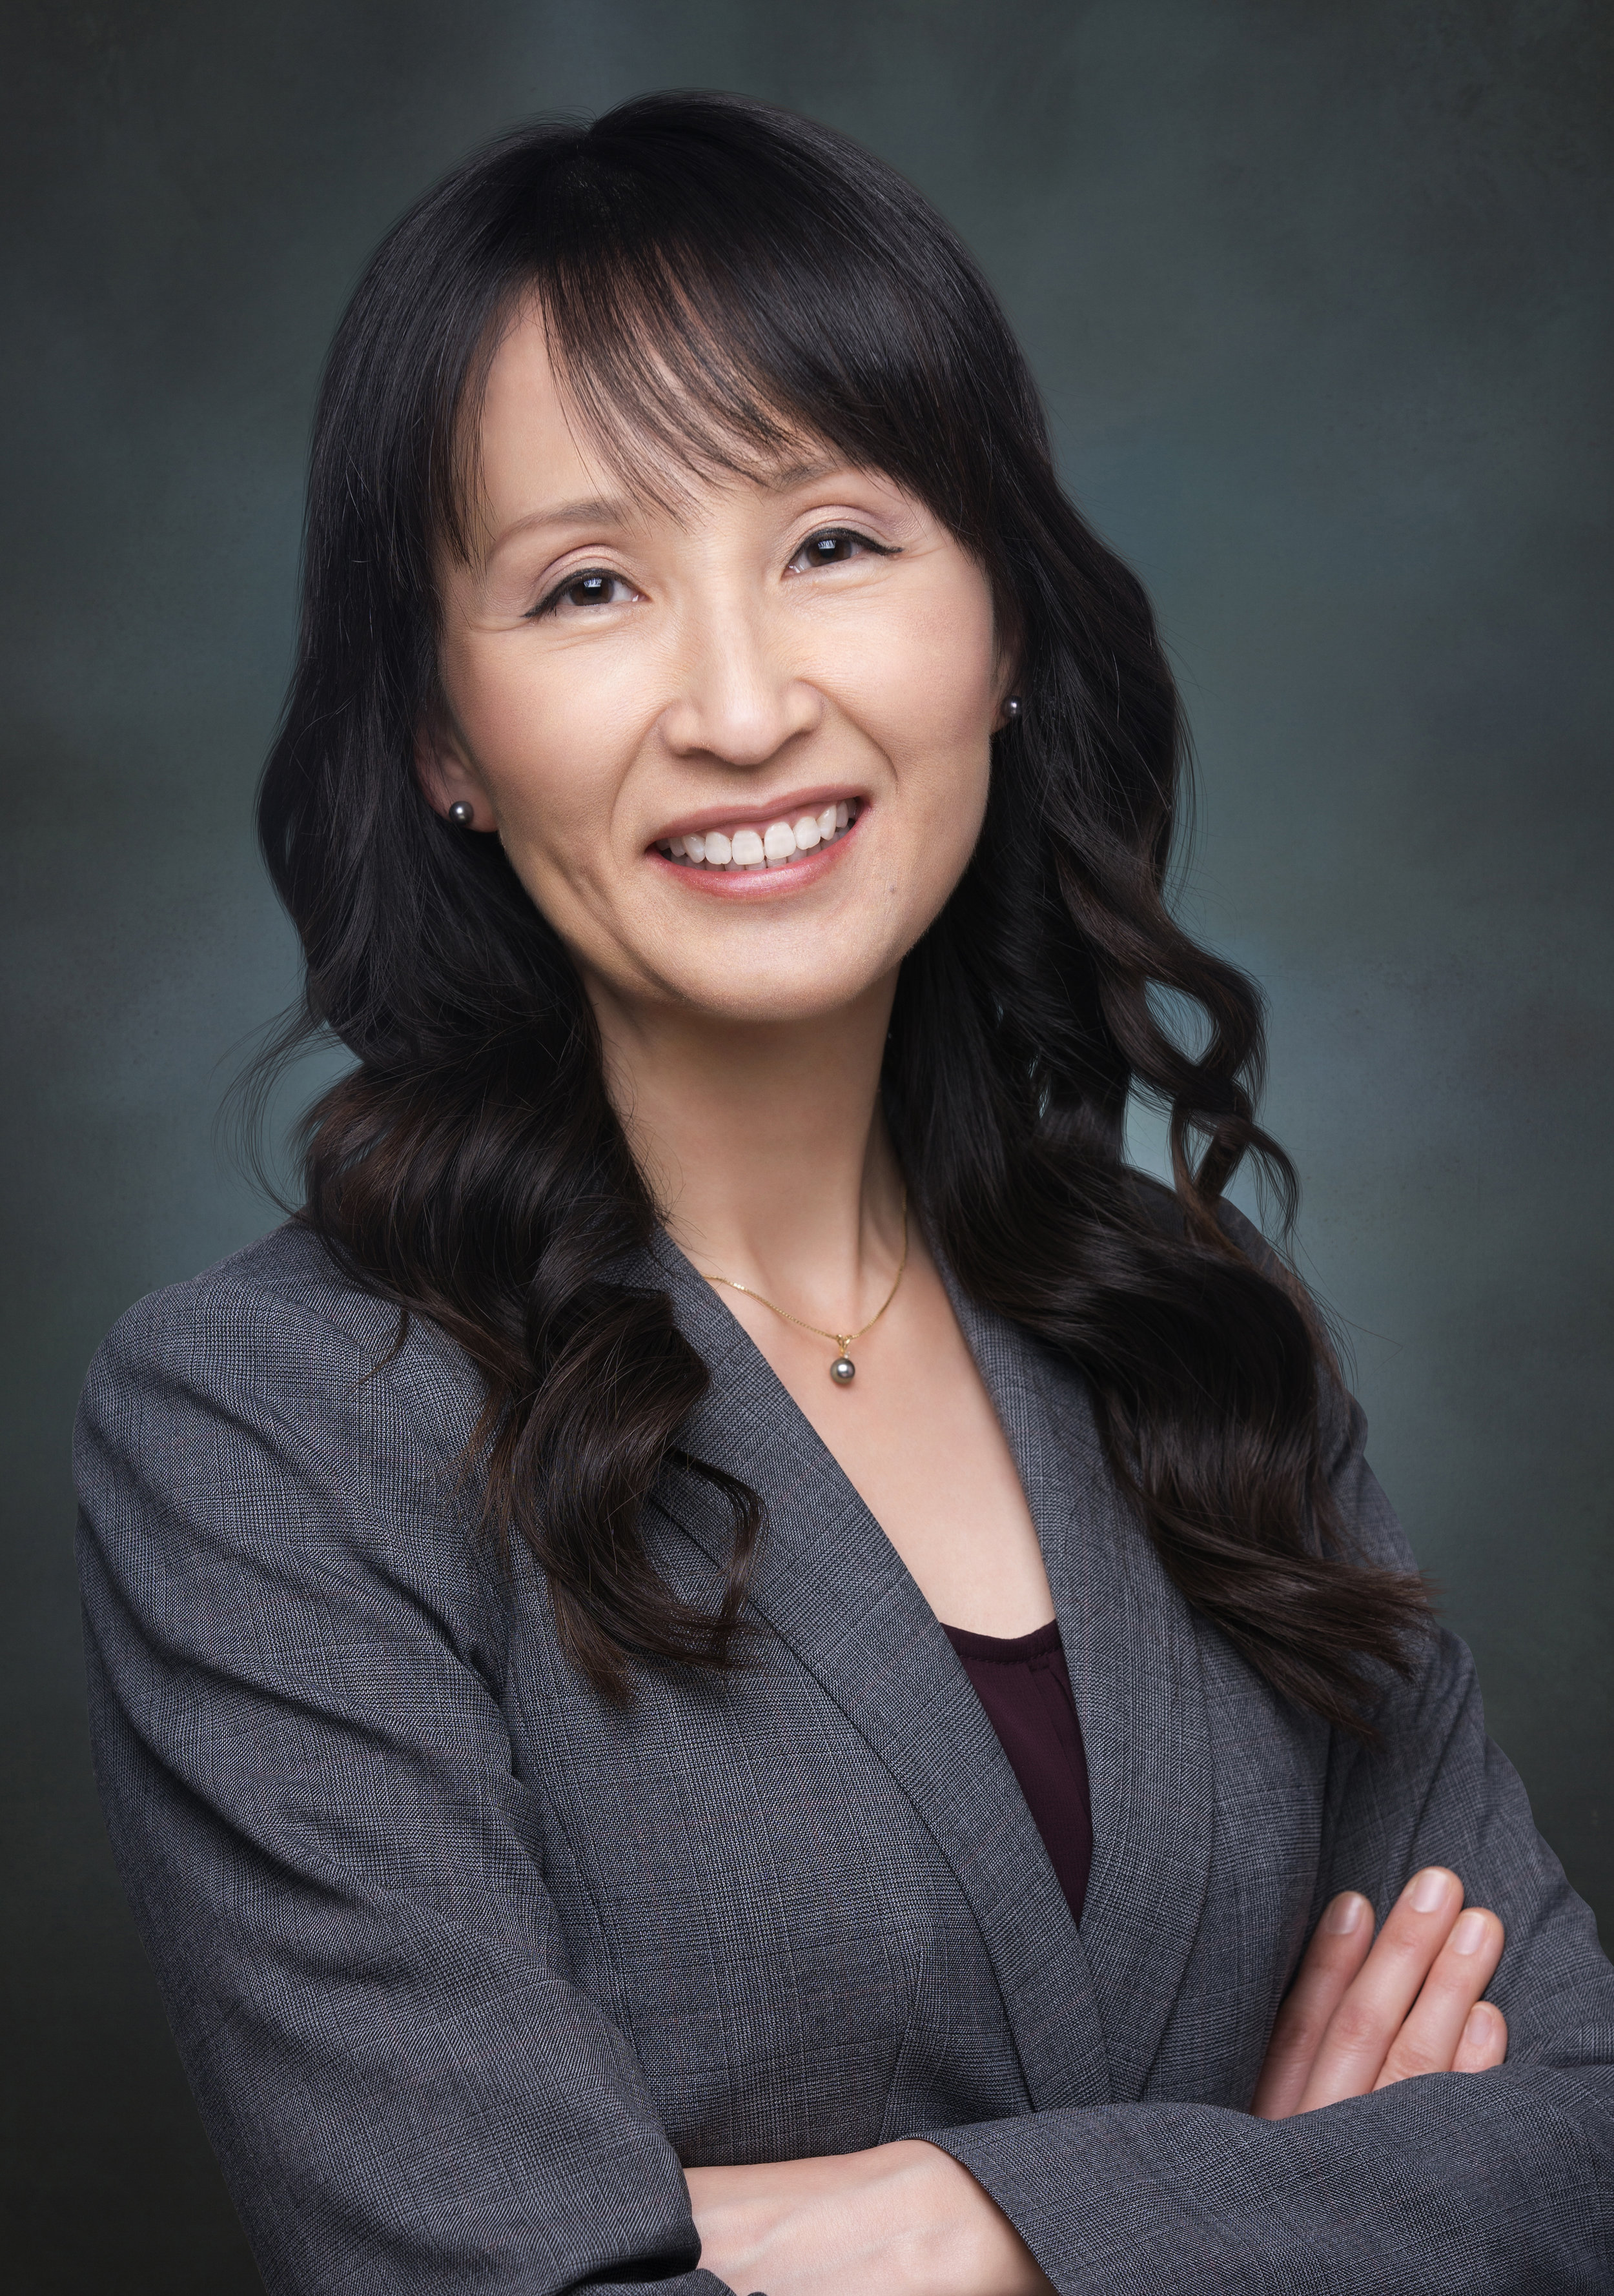 Josephine E. Chang, Lewis Roca Rothgerber Christie's Intellectual